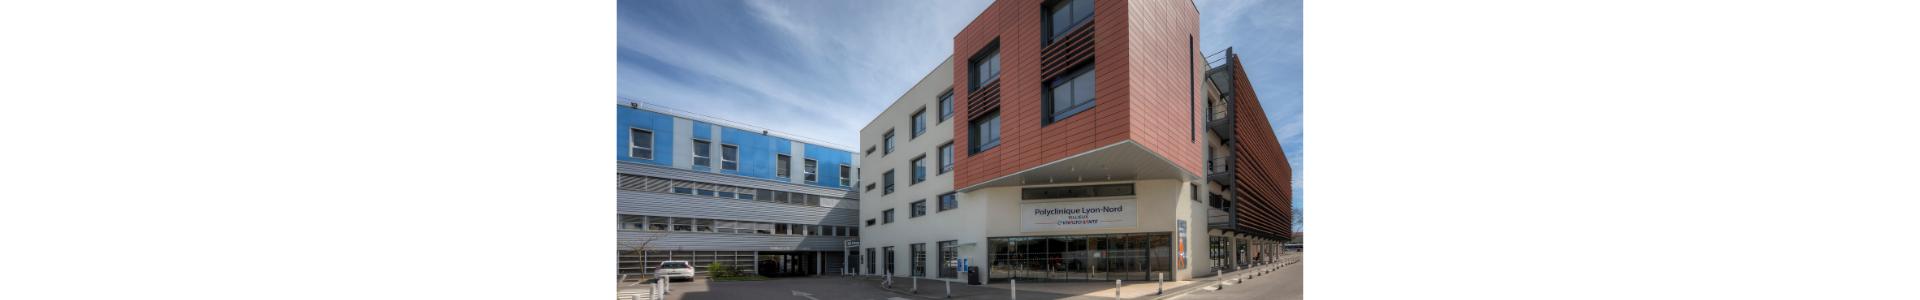 façade de la Polyclinique Lyon-Nord